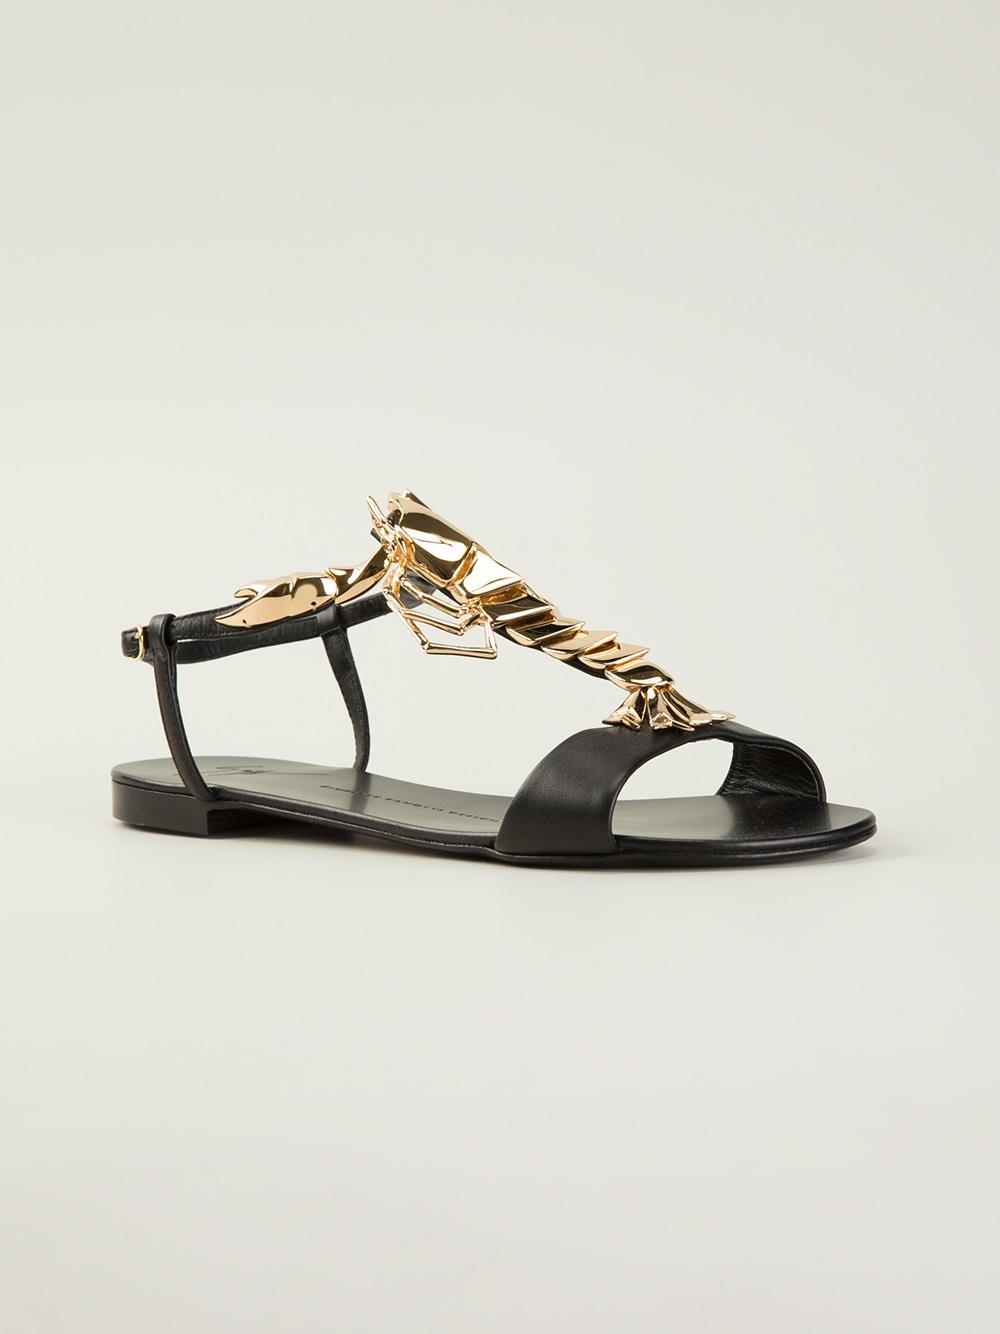 Lyst Giuseppe Zanotti Lobster Flat Sandal In Metallic